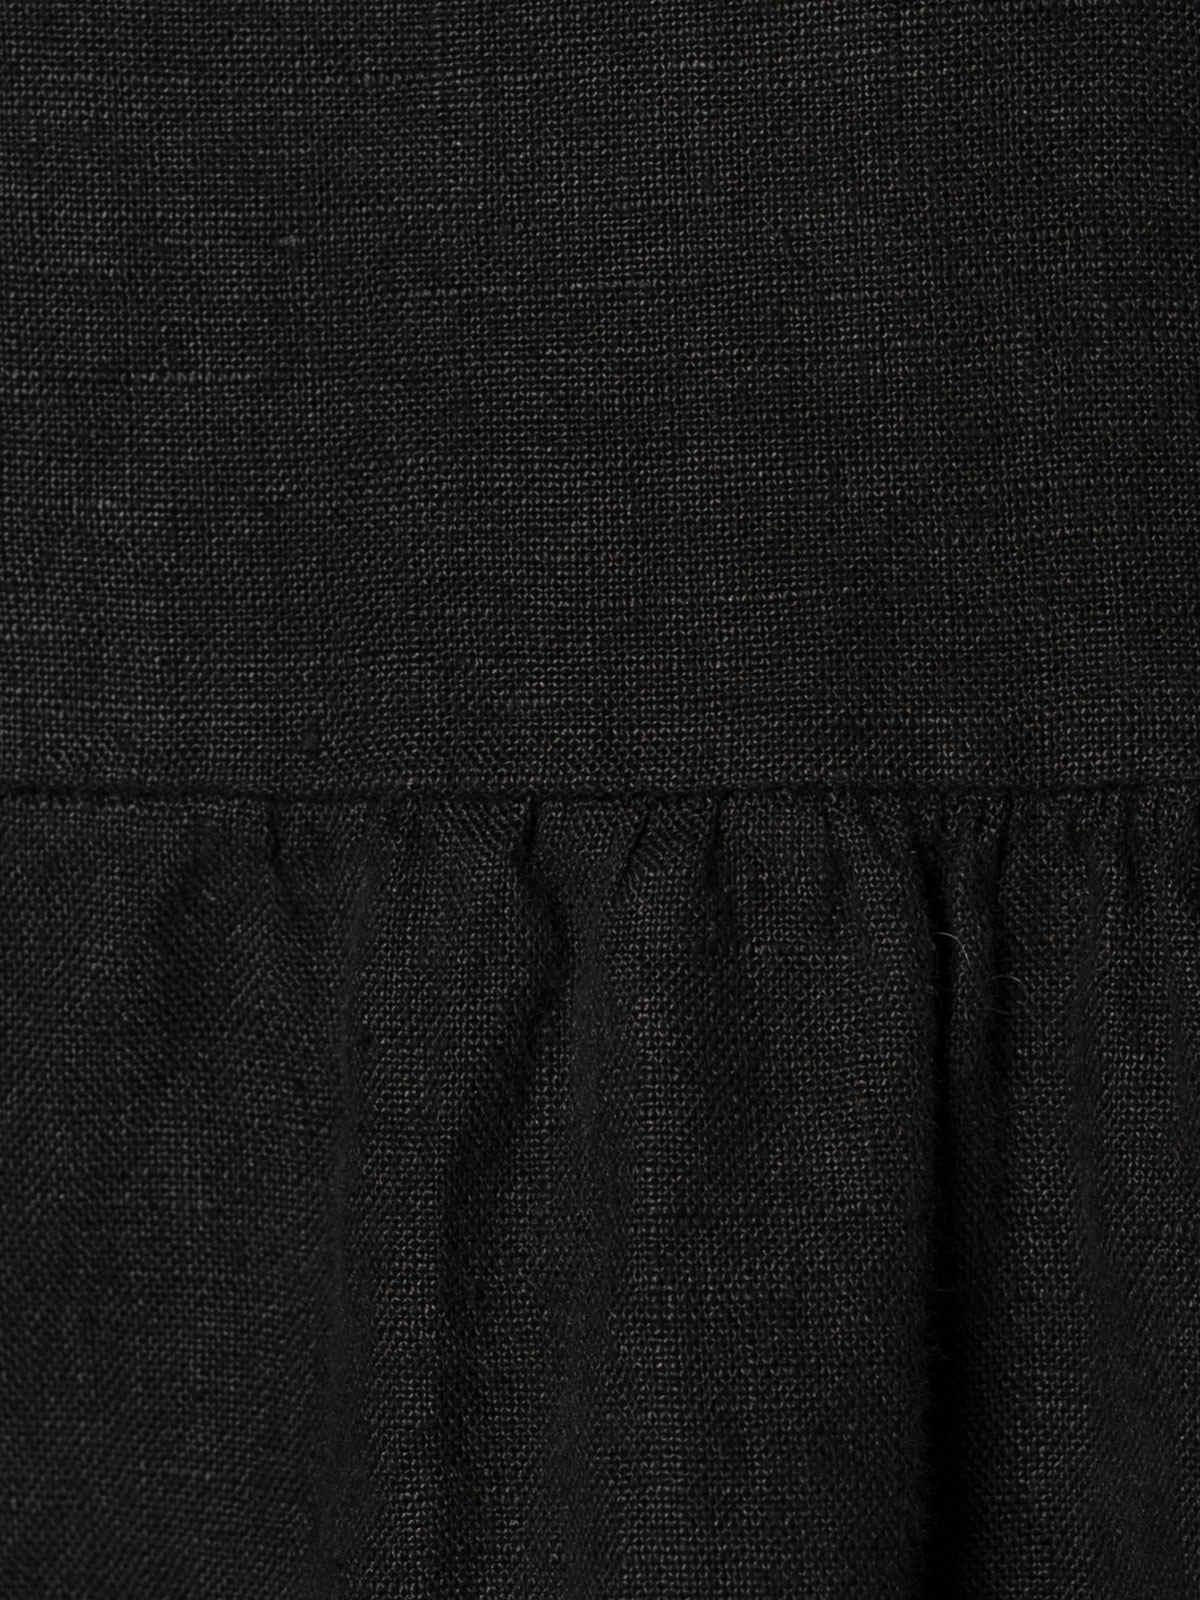 Chaqueta mujer lino botones Negro